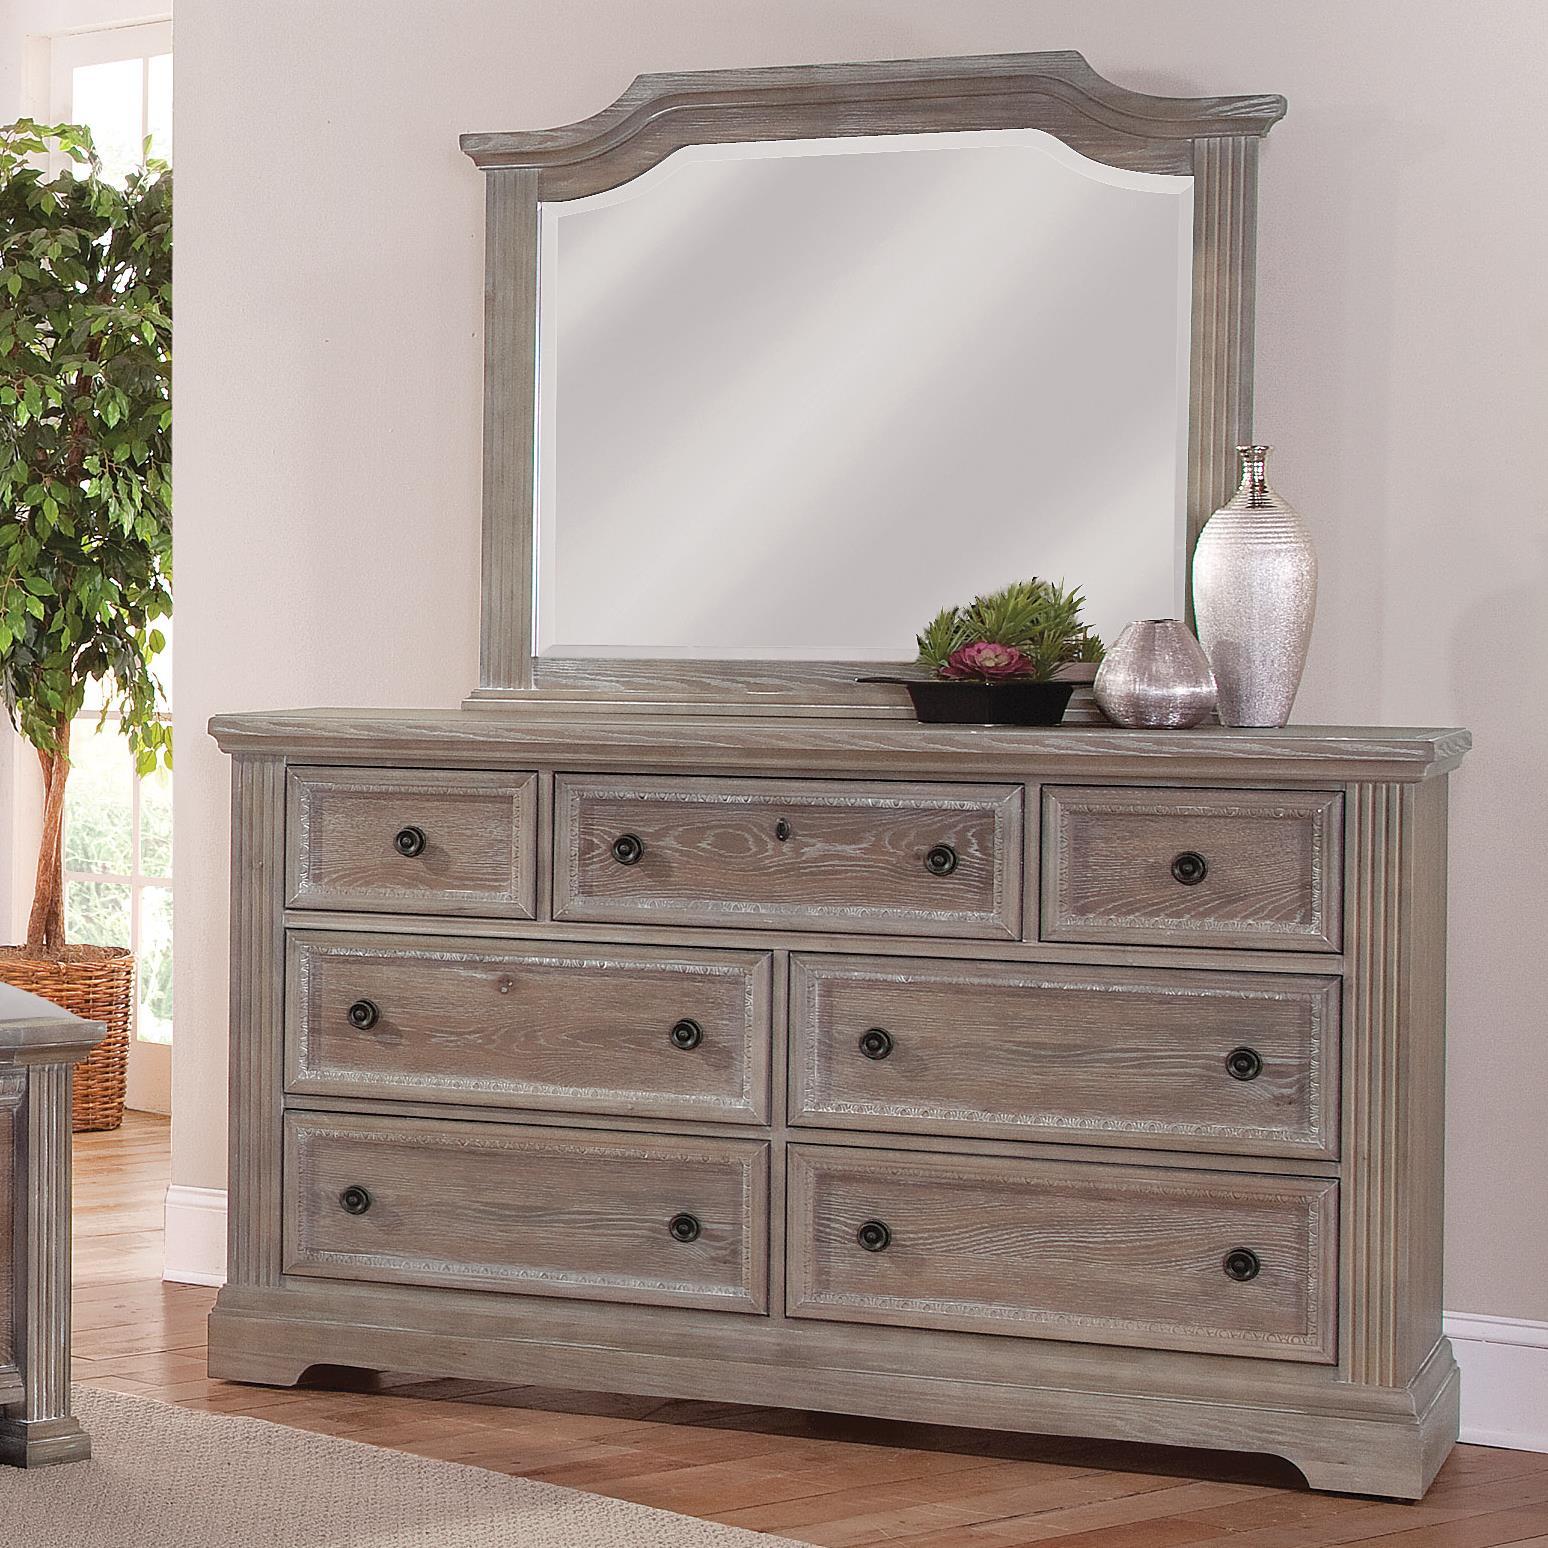 Vaughan Bassett Affinity Dresser & Arch Mirror - Item Number: 564-002+447